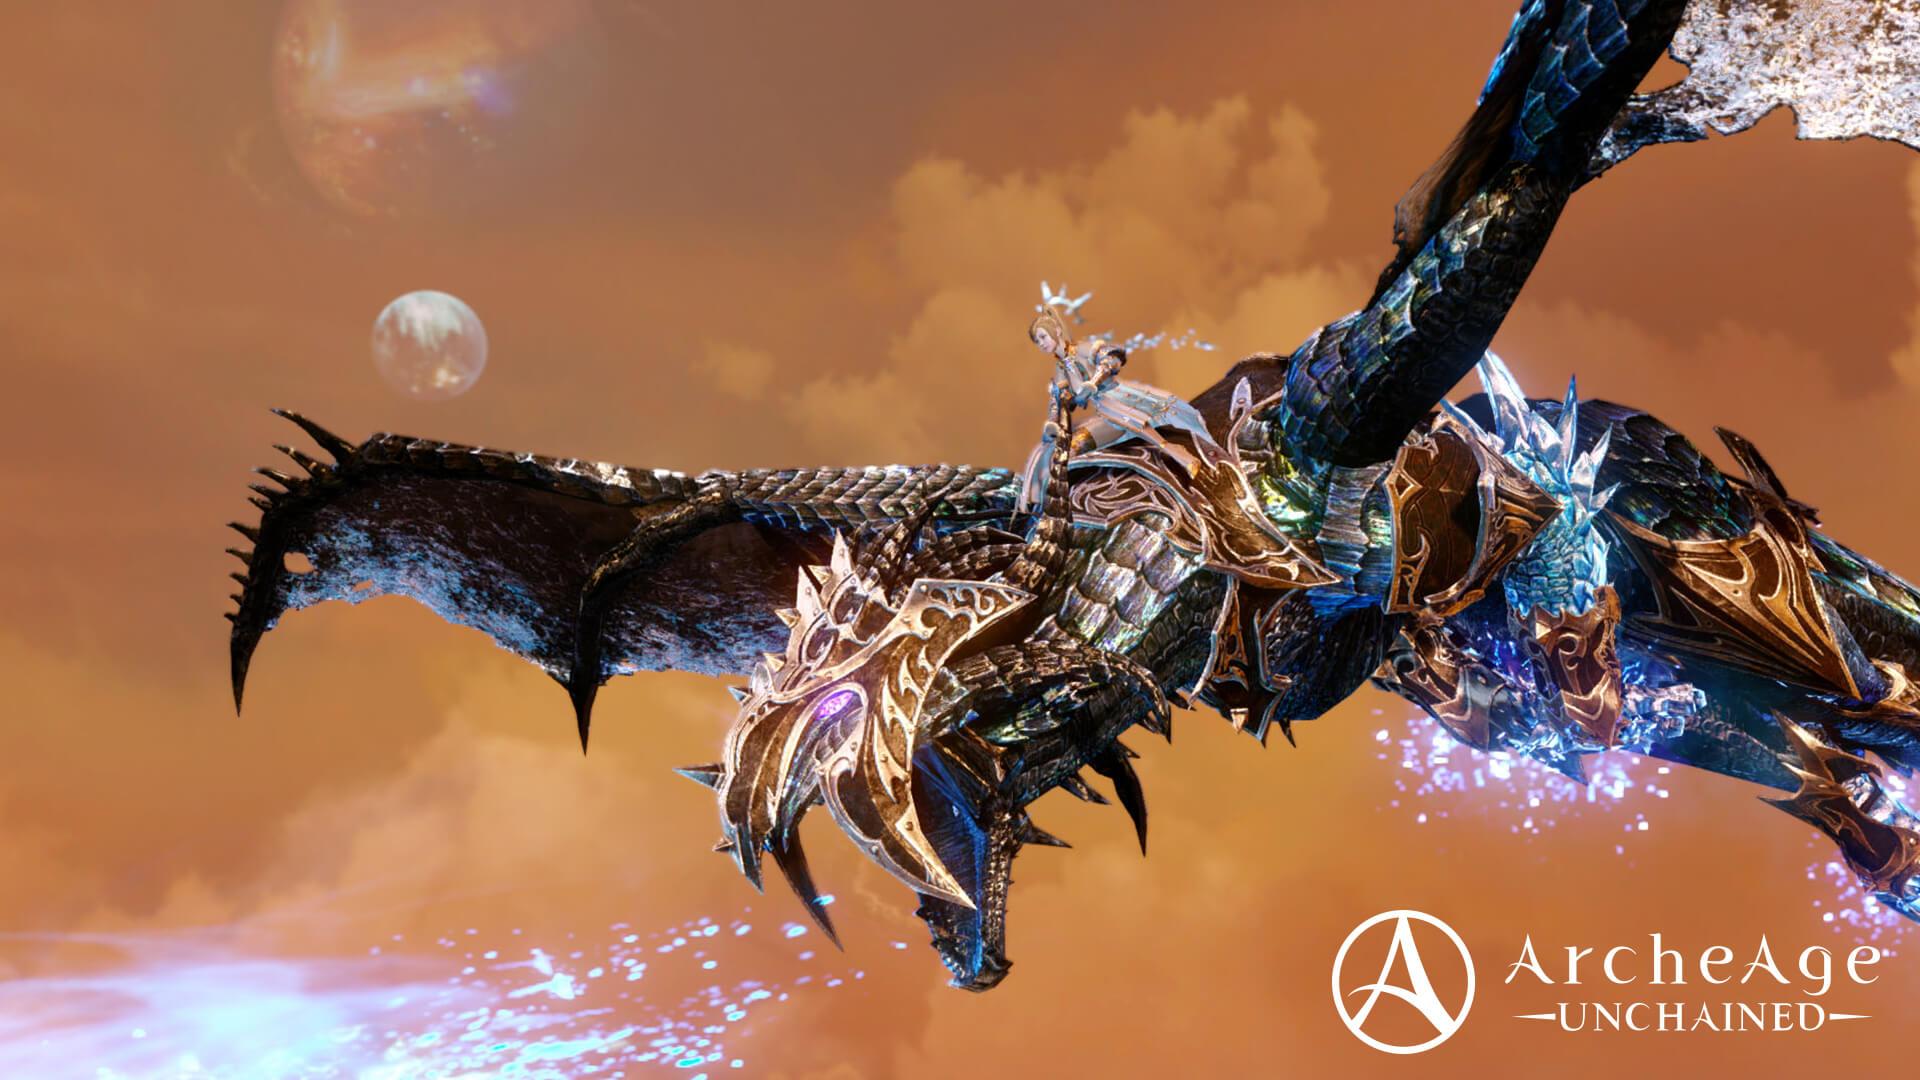 archeage screenshot dragon